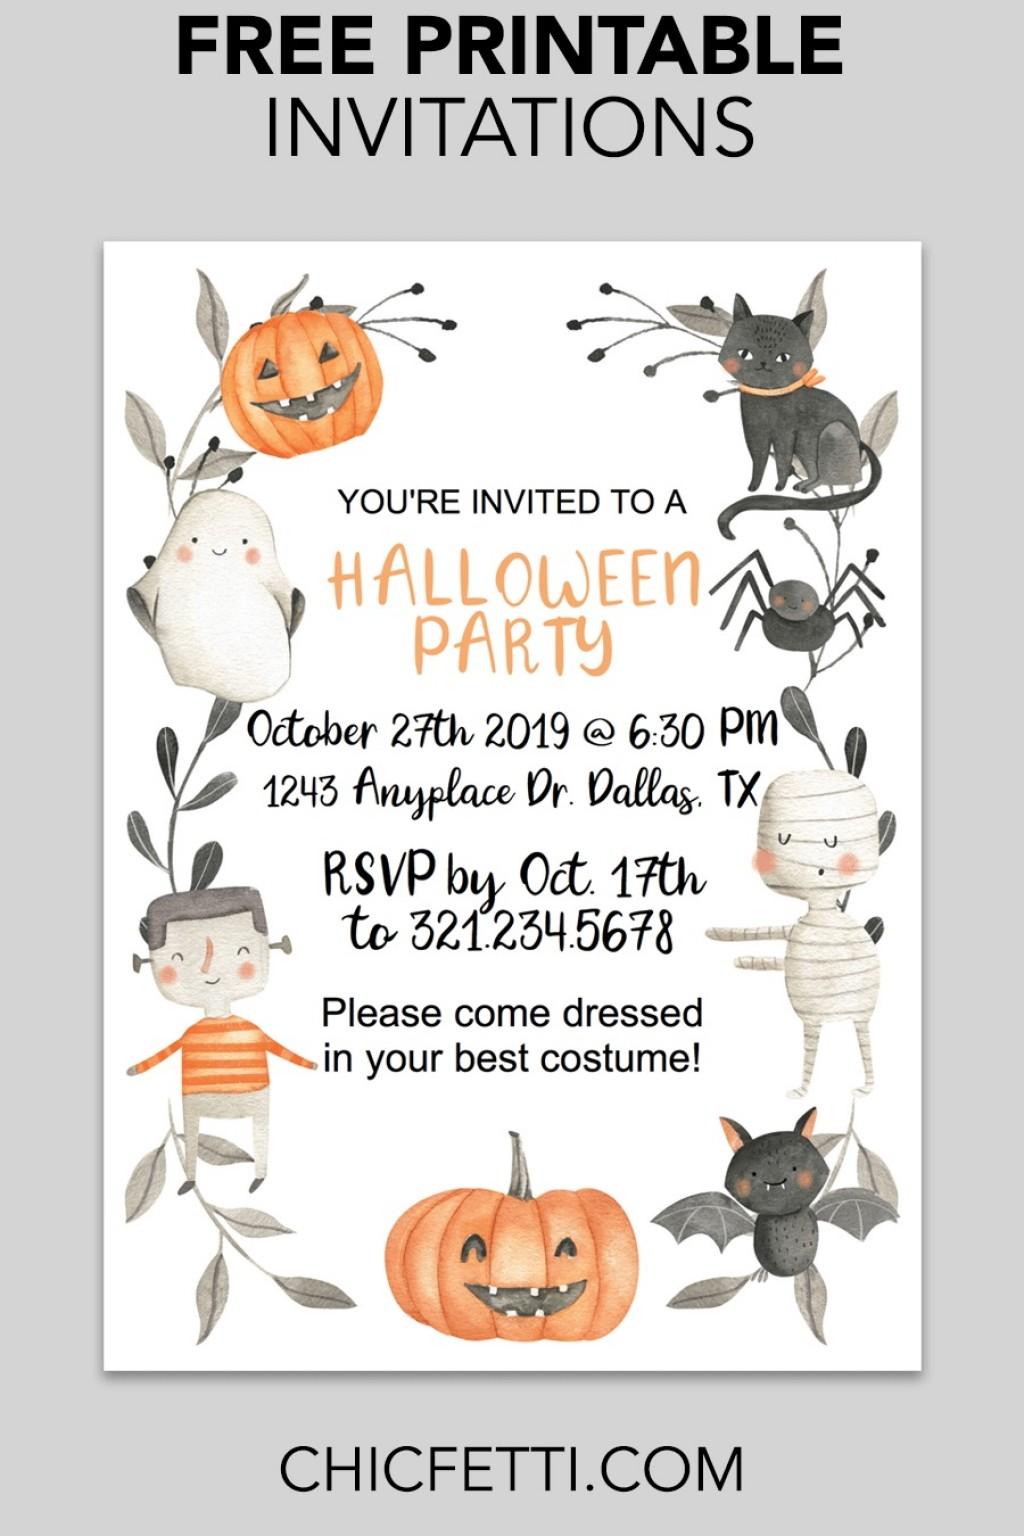 005 Wondrou Free Halloween Invite Template Concept  Templates Party Invitation For WordLarge